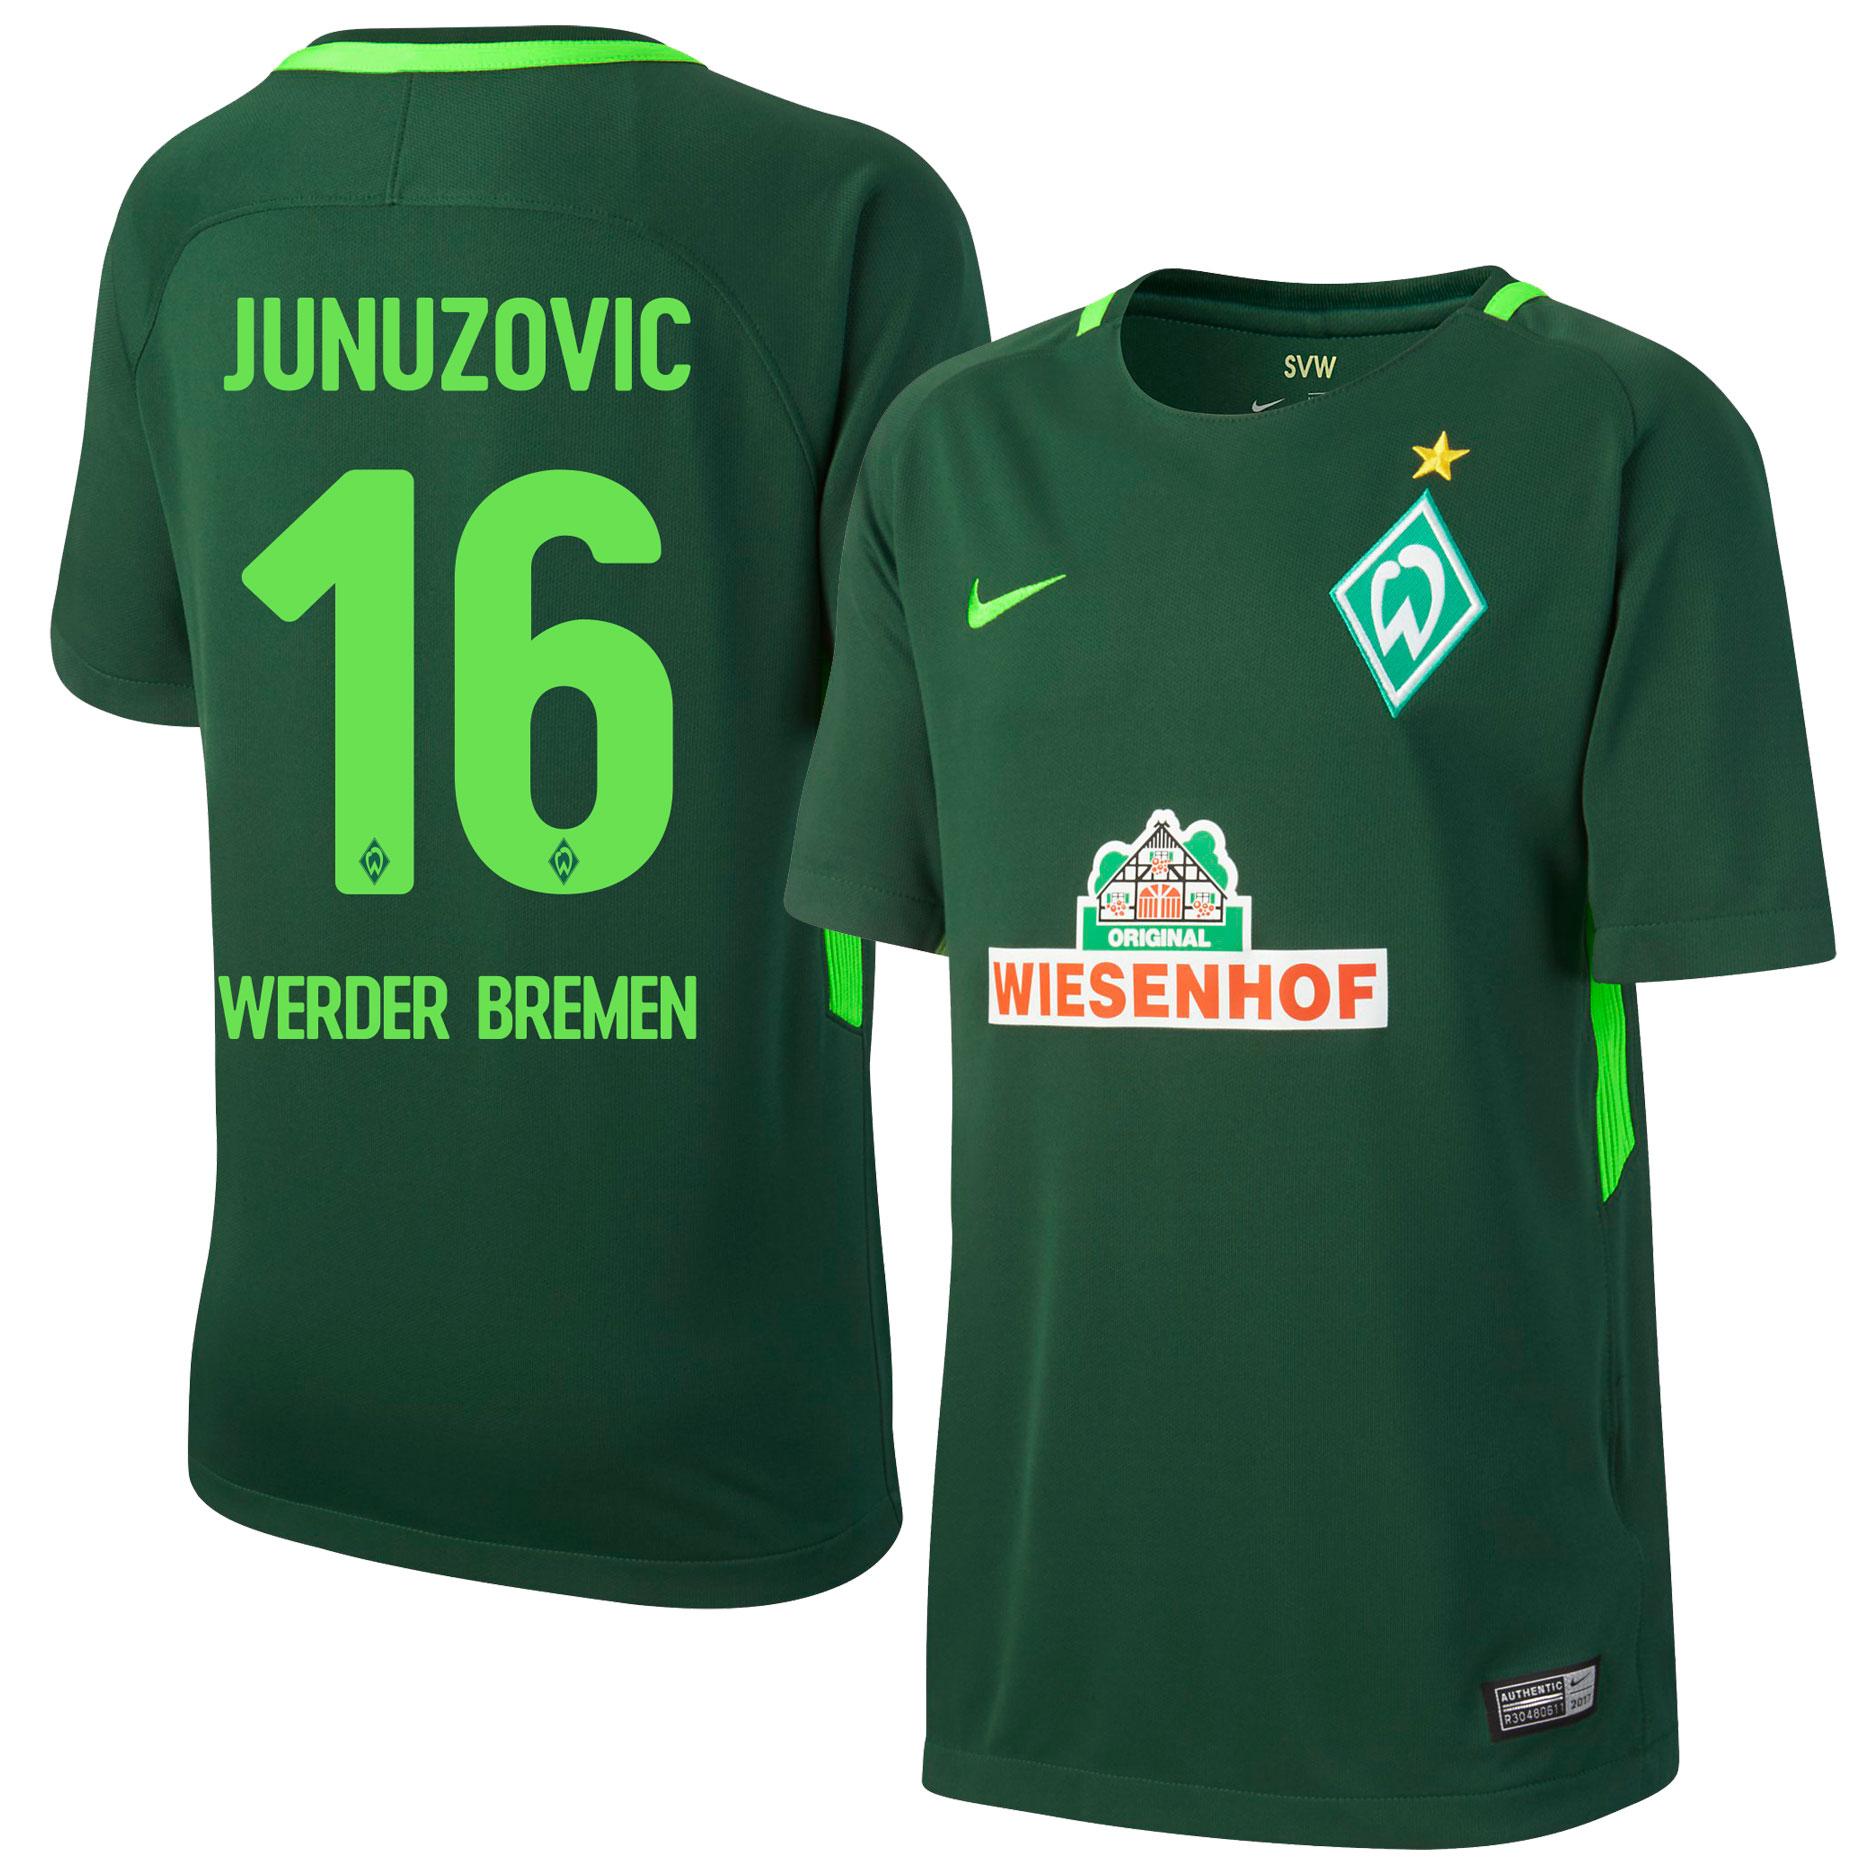 Werder Bremen Home Junuzovic Jersey 2017 / 2018 (Official Printing) - M